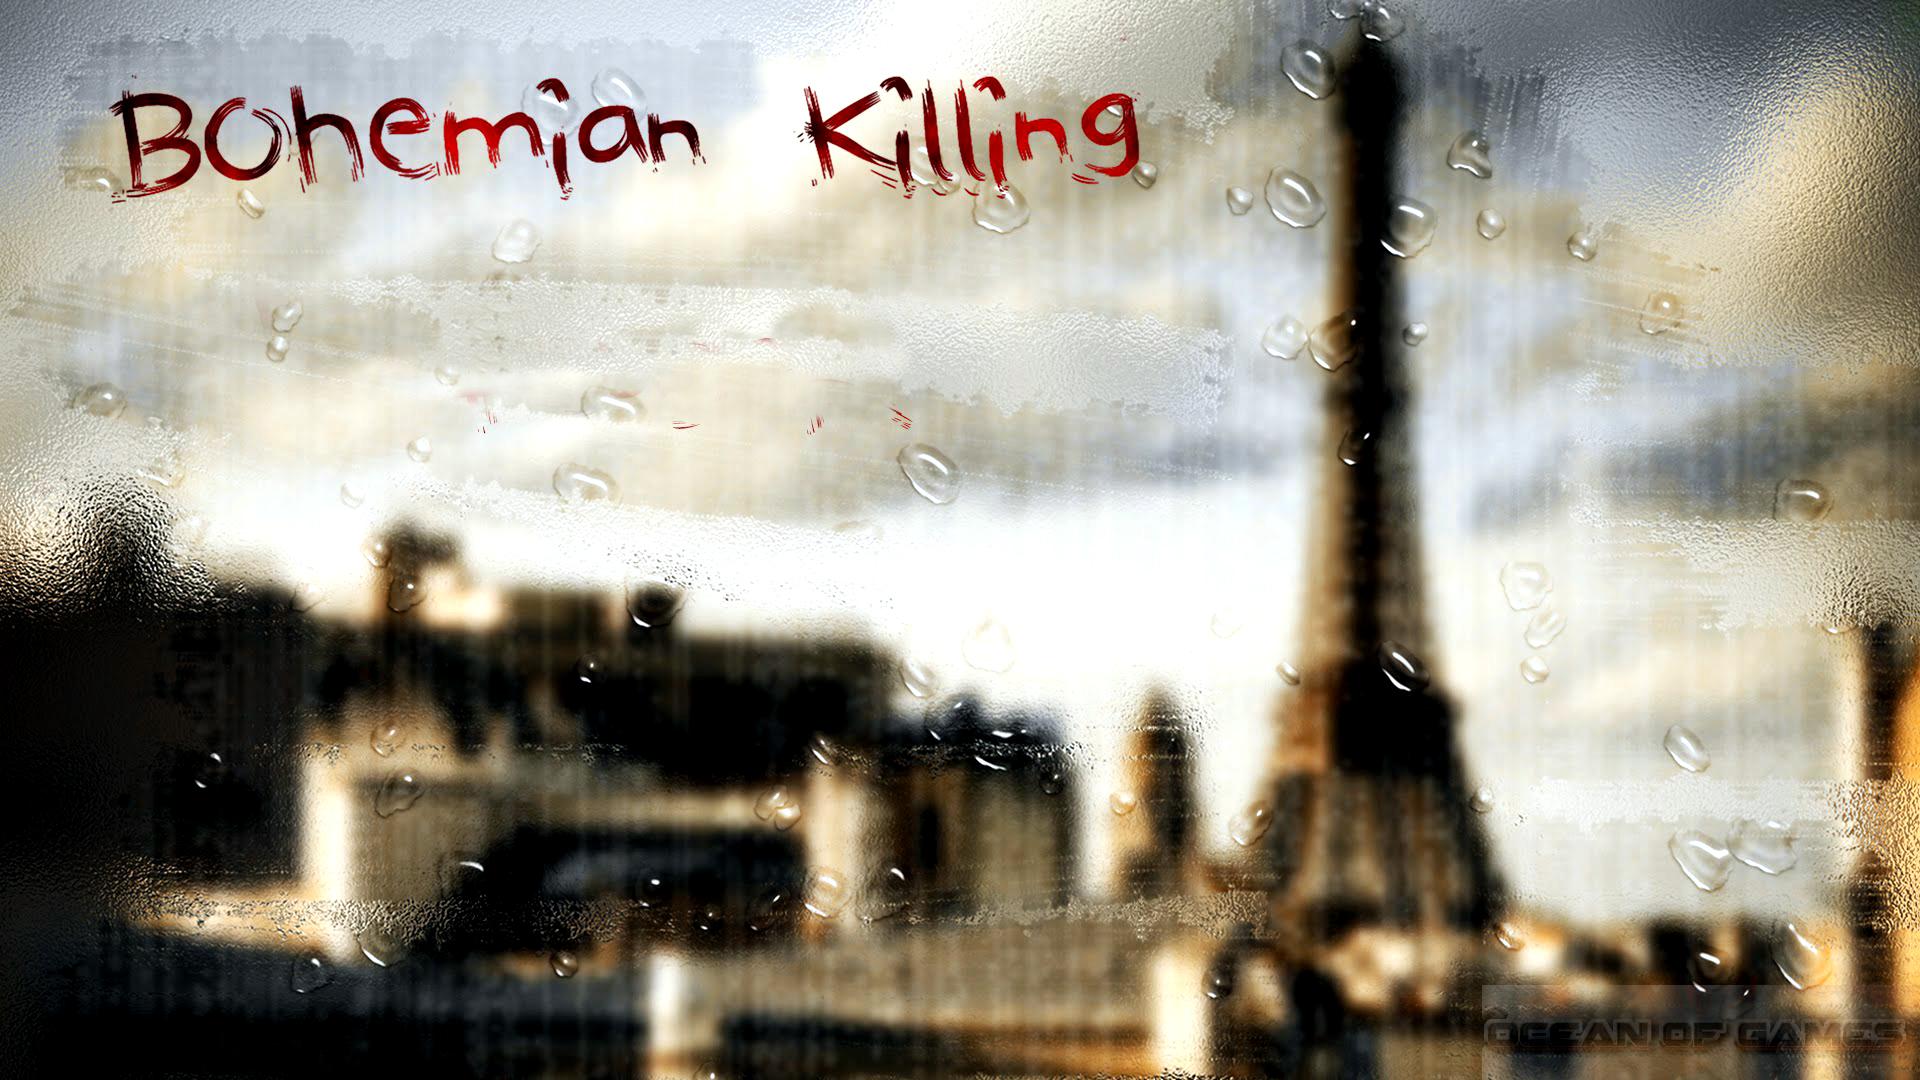 Bohemian Killing Free Download